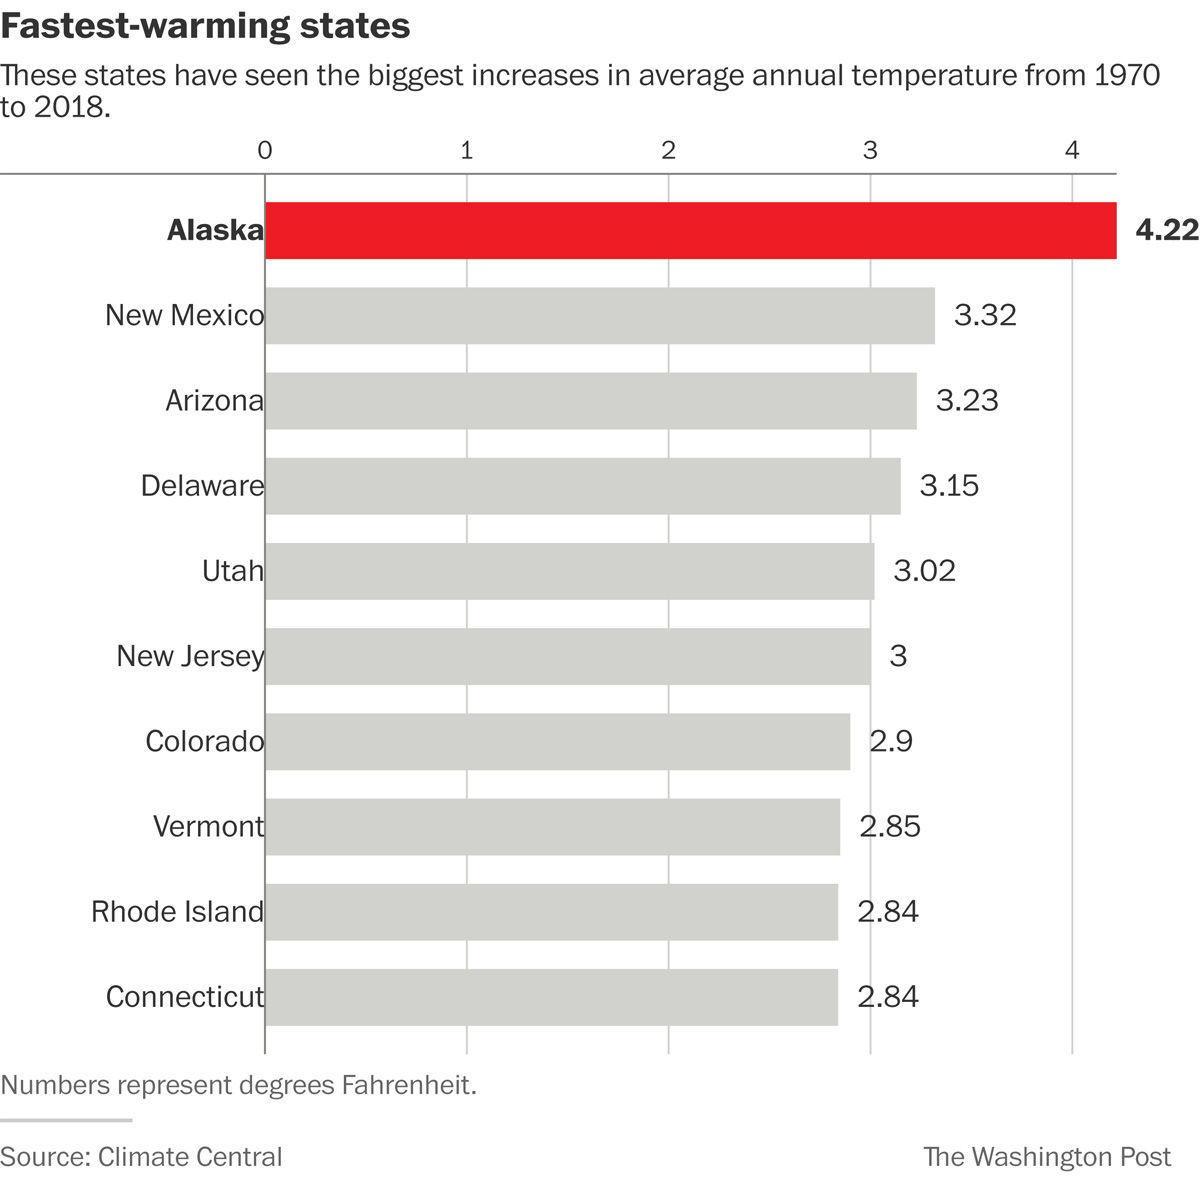 fastest warming states.jpg